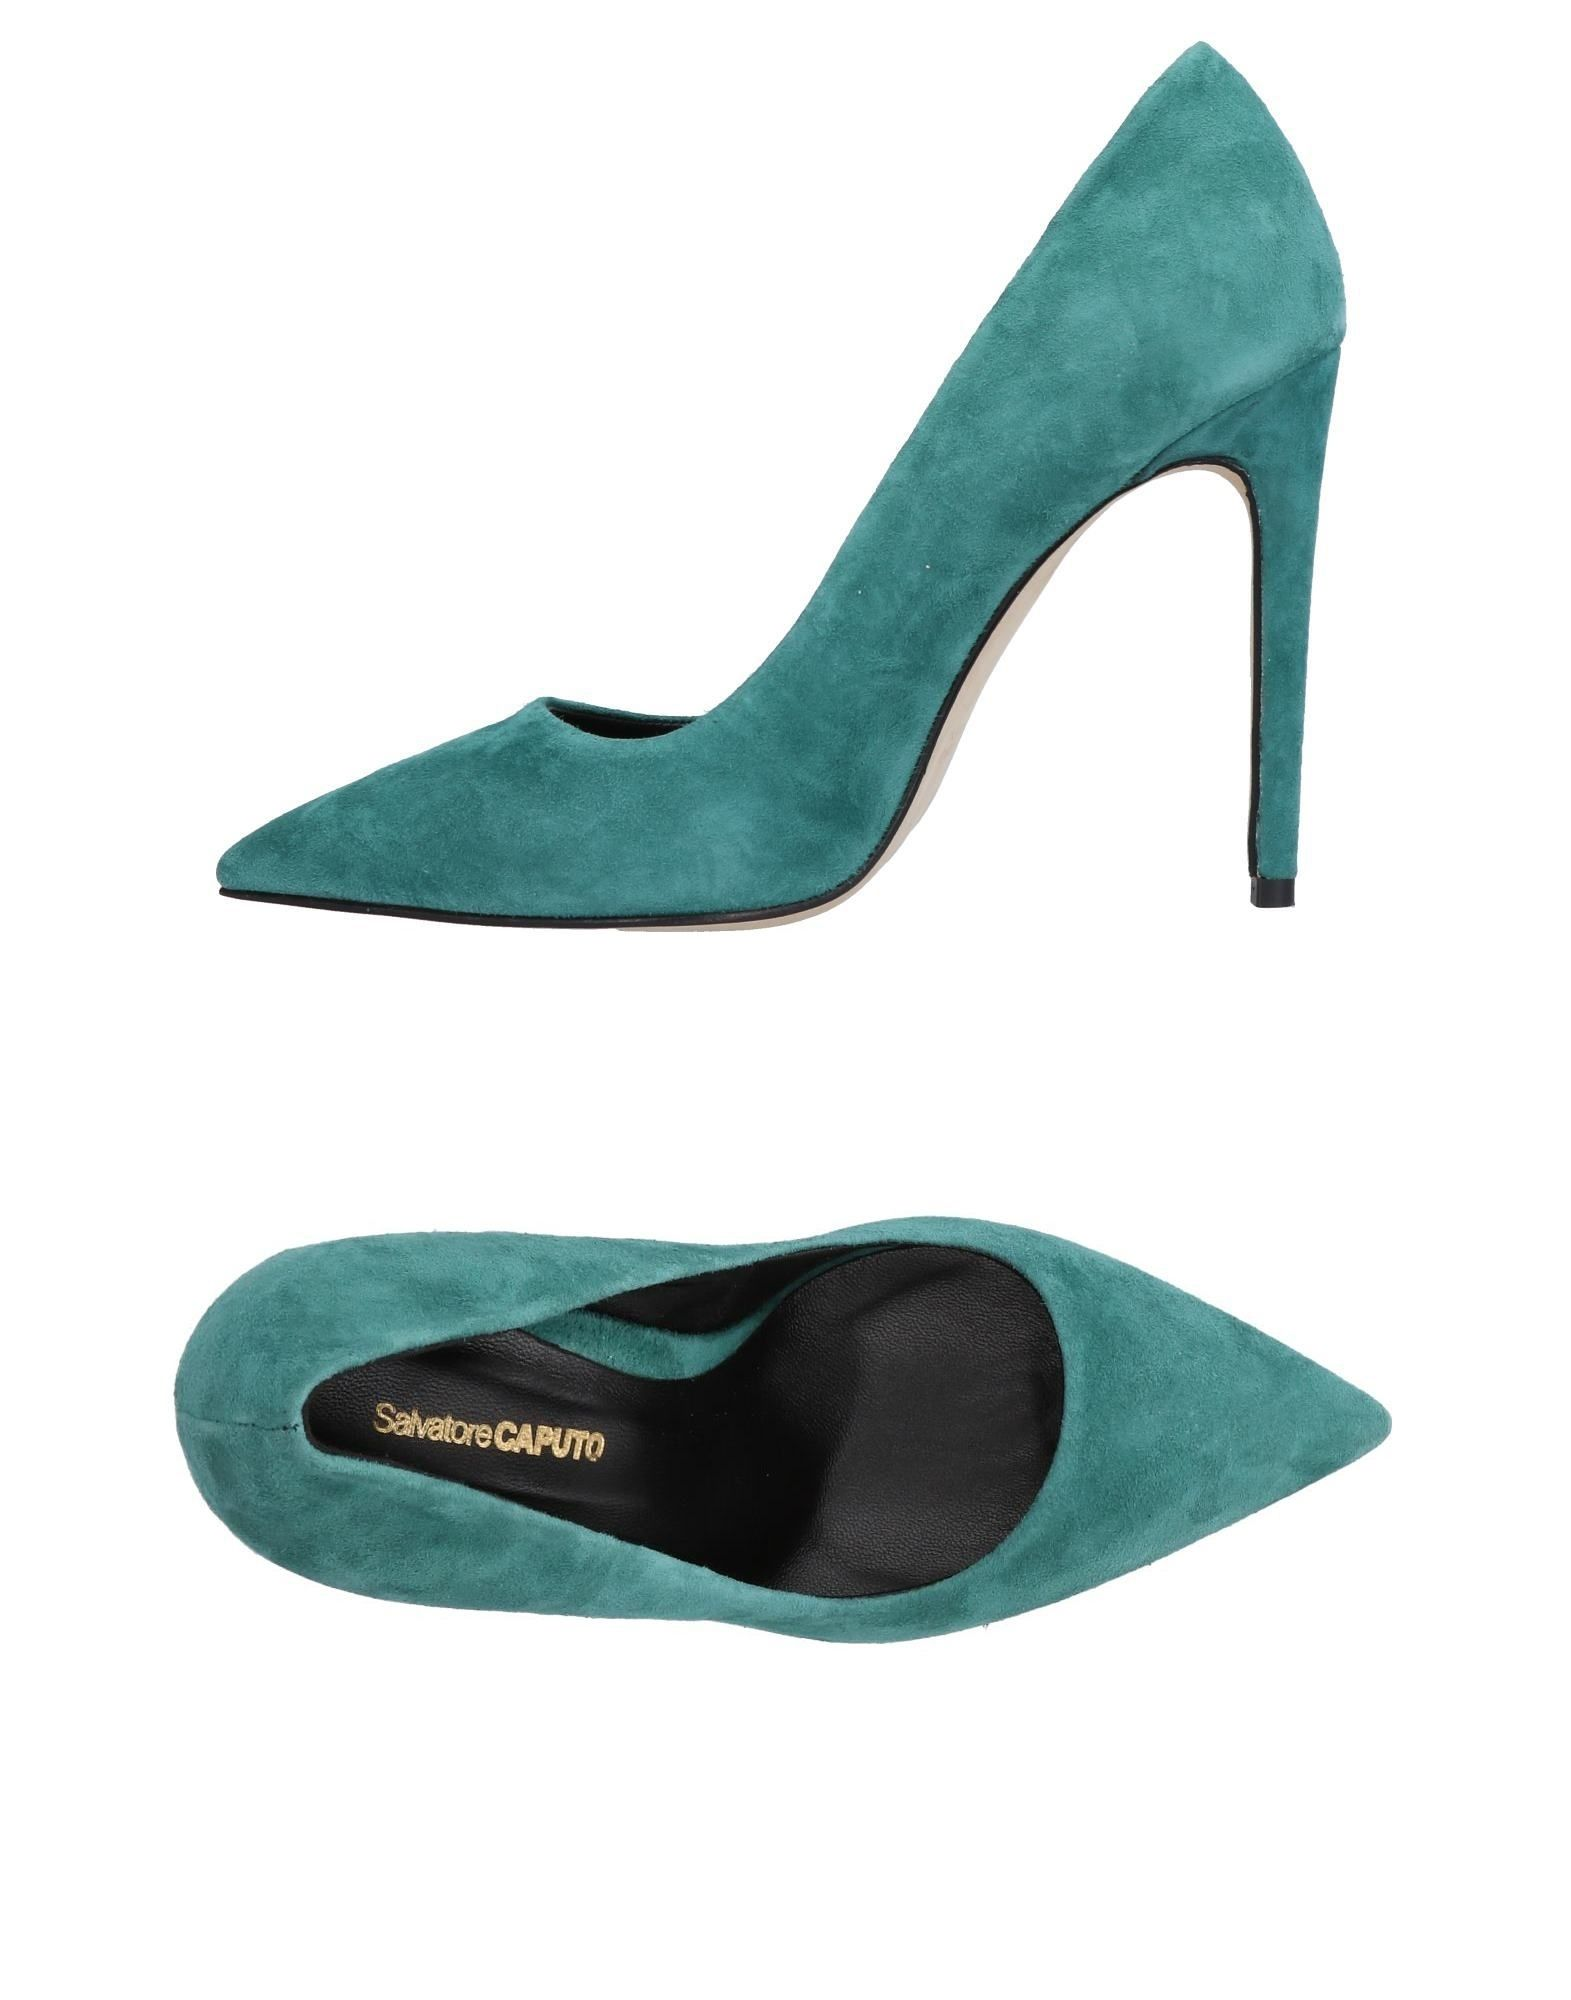 Salvatore 11472681CD Caputo Pumps Damen  11472681CD Salvatore Gute Qualität beliebte Schuhe 064177